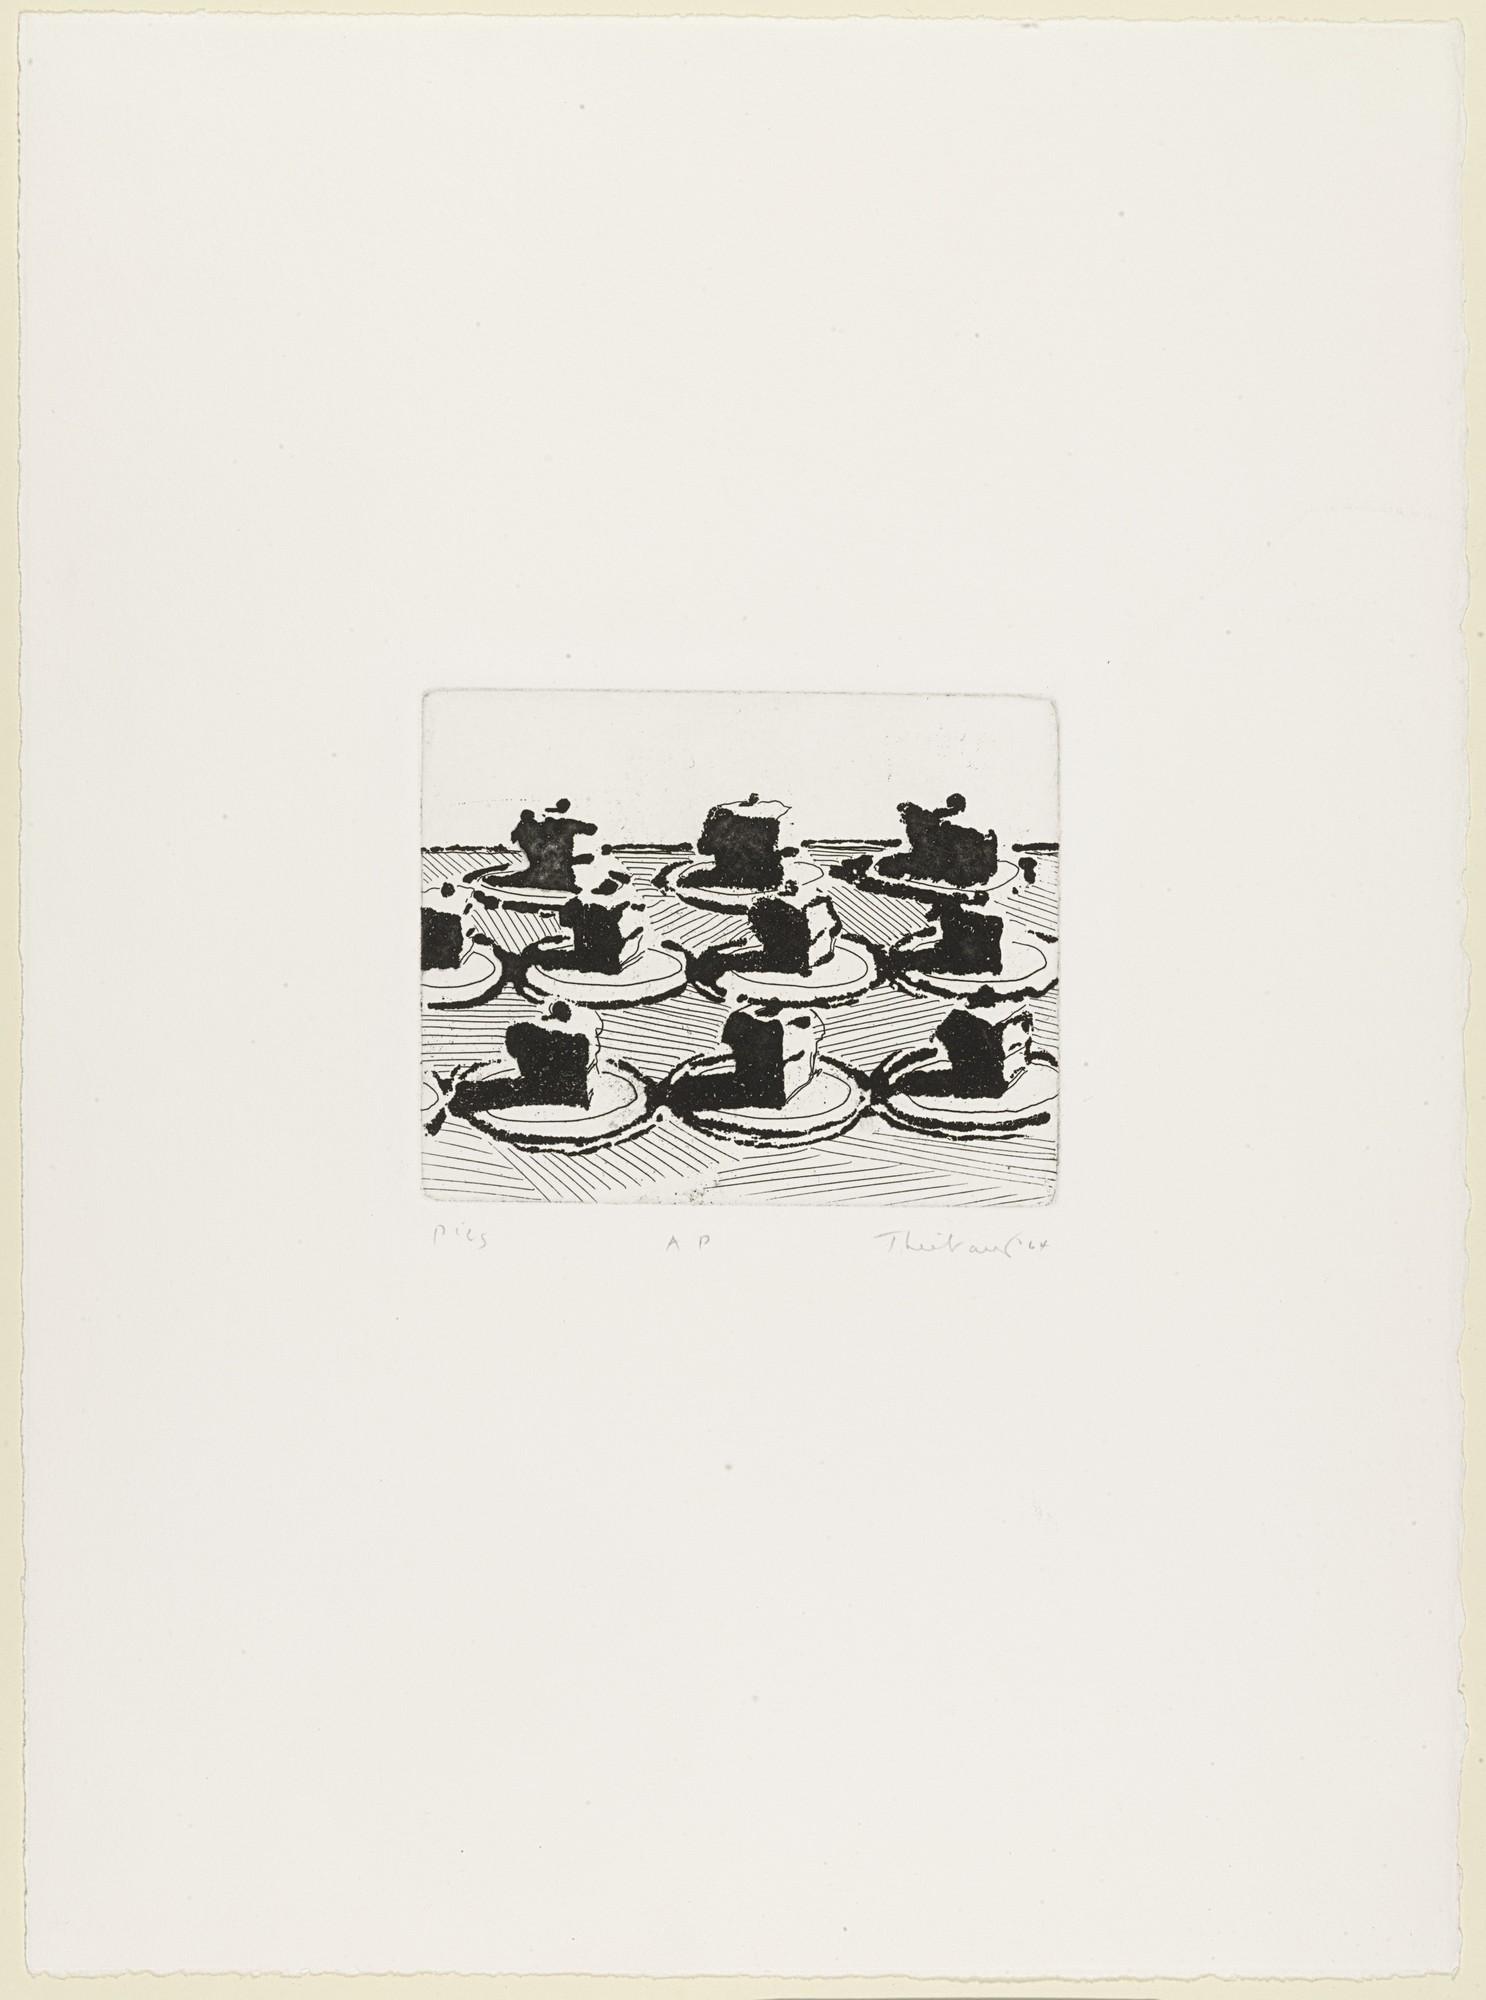 Pies by Wayne Thiebaud